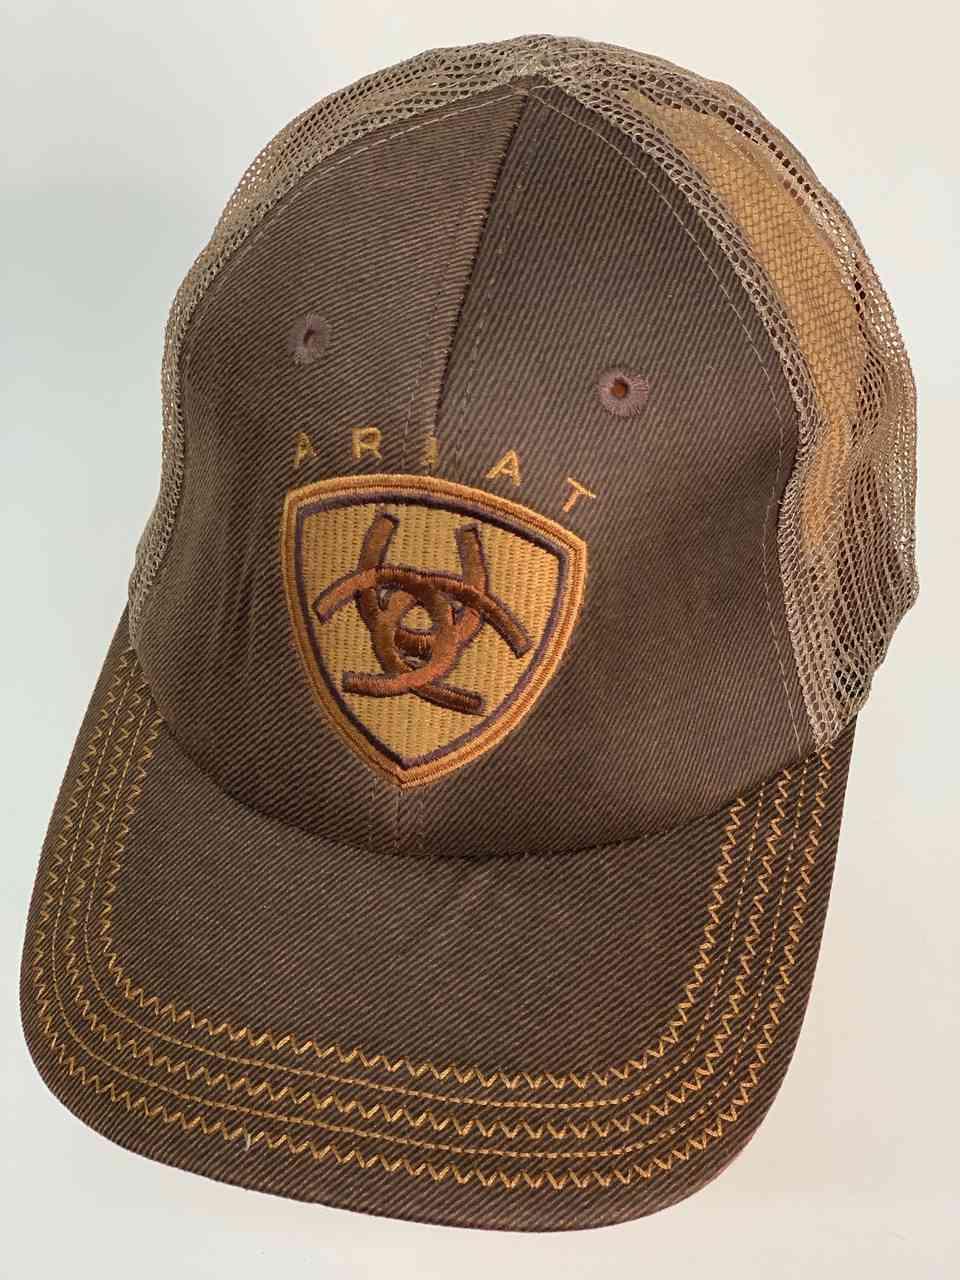 Летняя кепка с логотипом Ariat